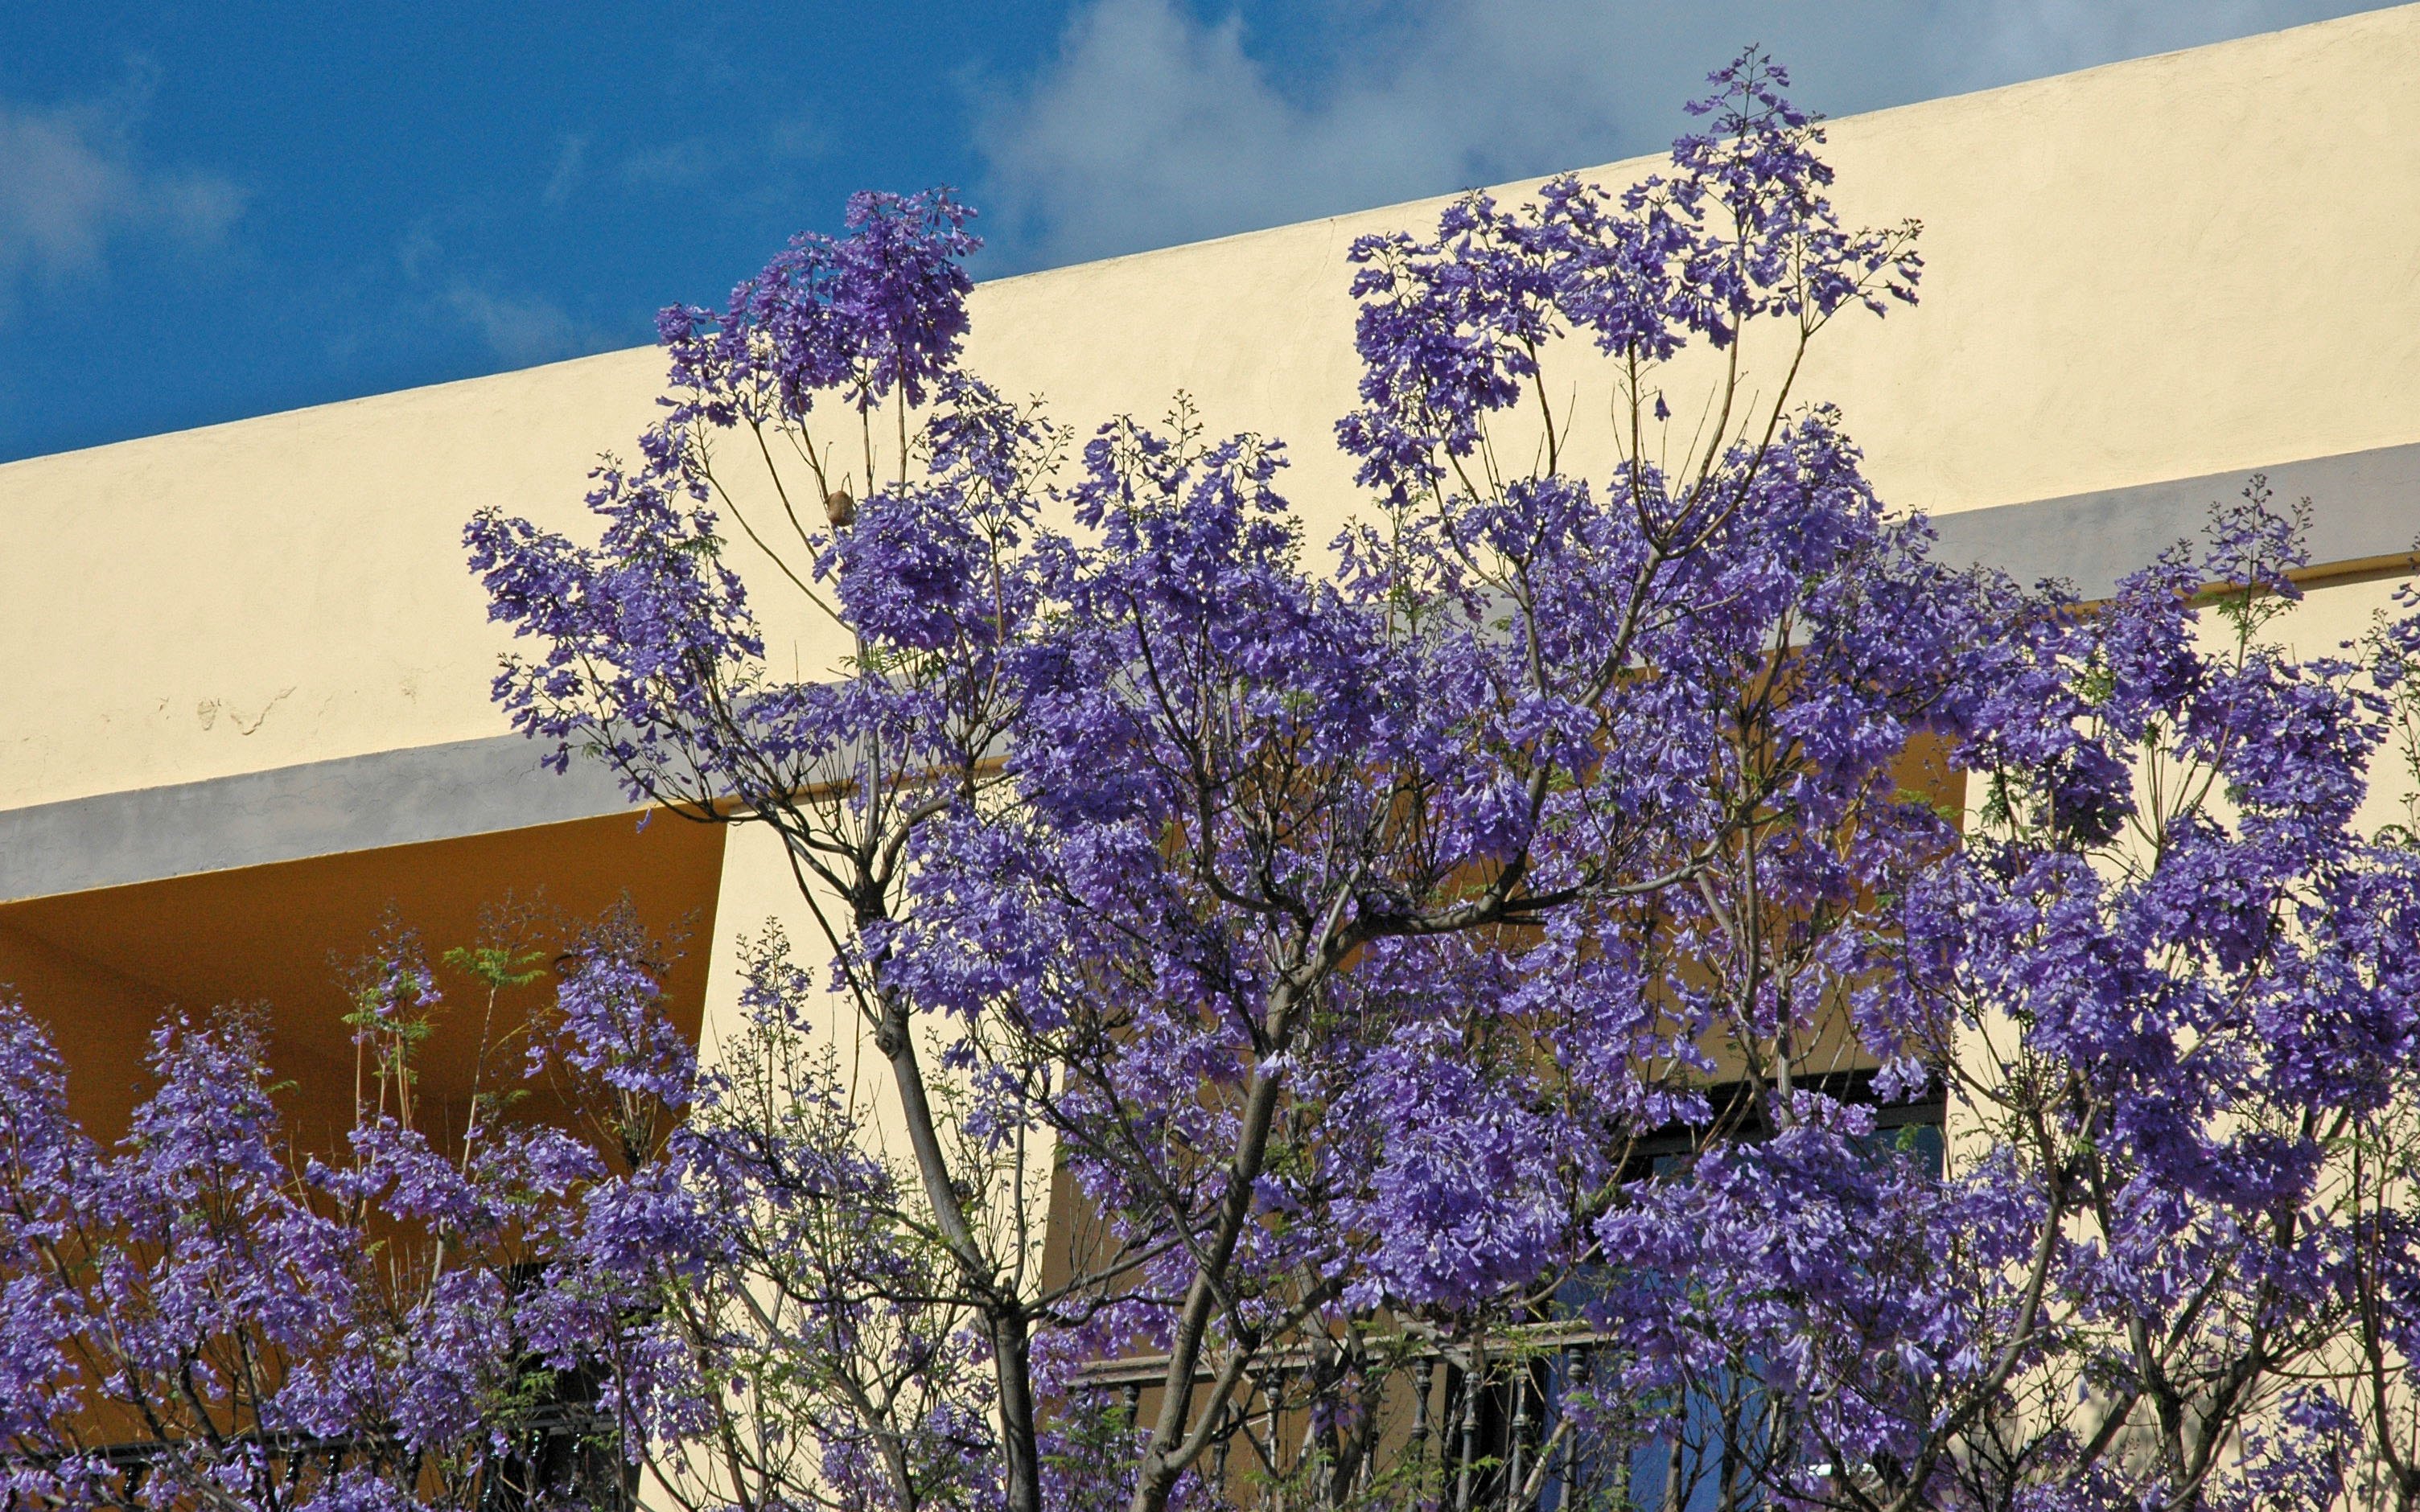 Flower gallery bignoniaceae nikb3485 for Planta ornamental jacaranda